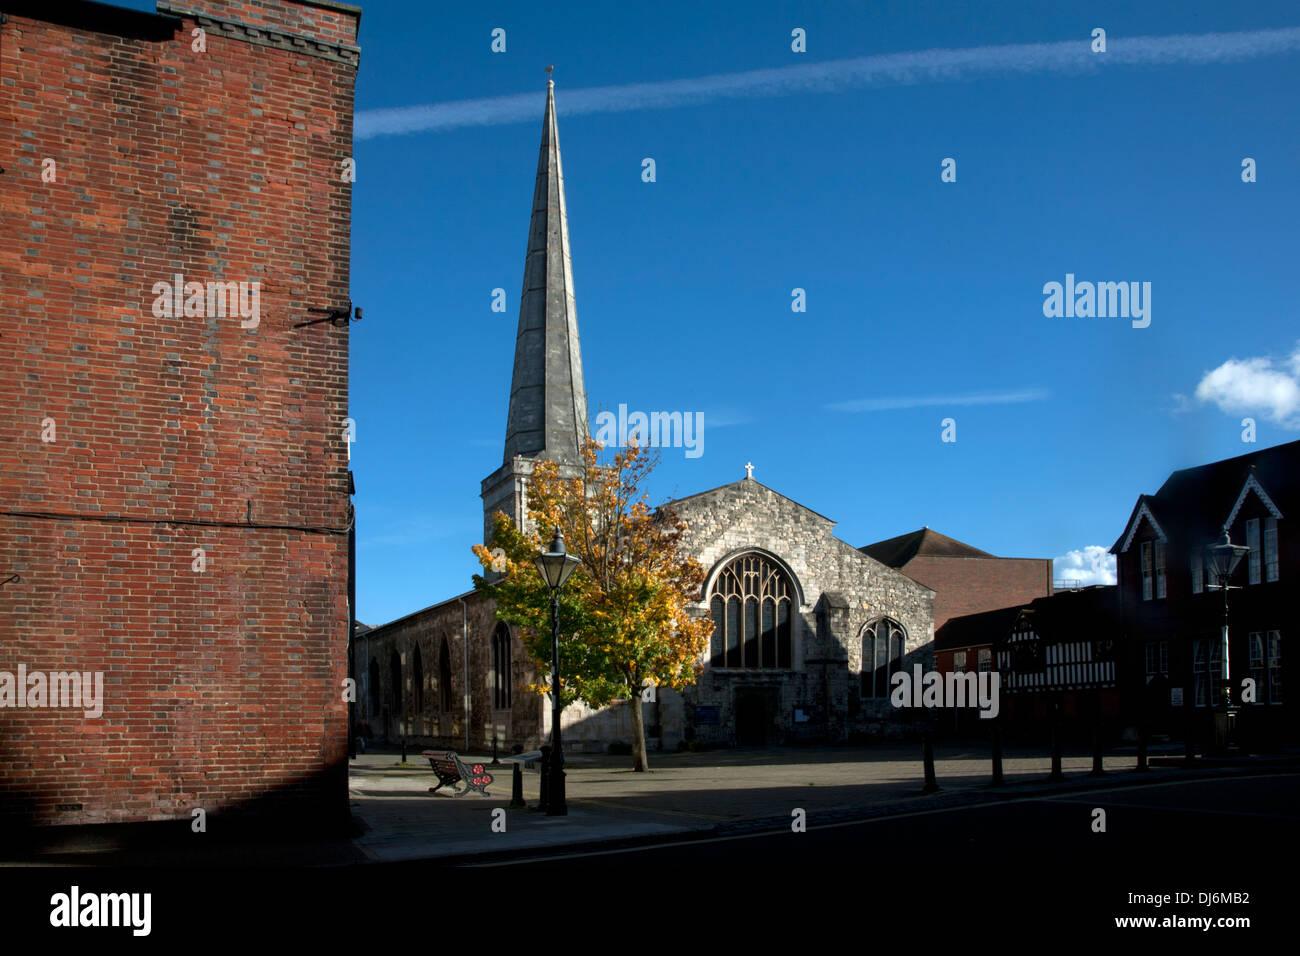 southampton old town hampshire england - Stock Image